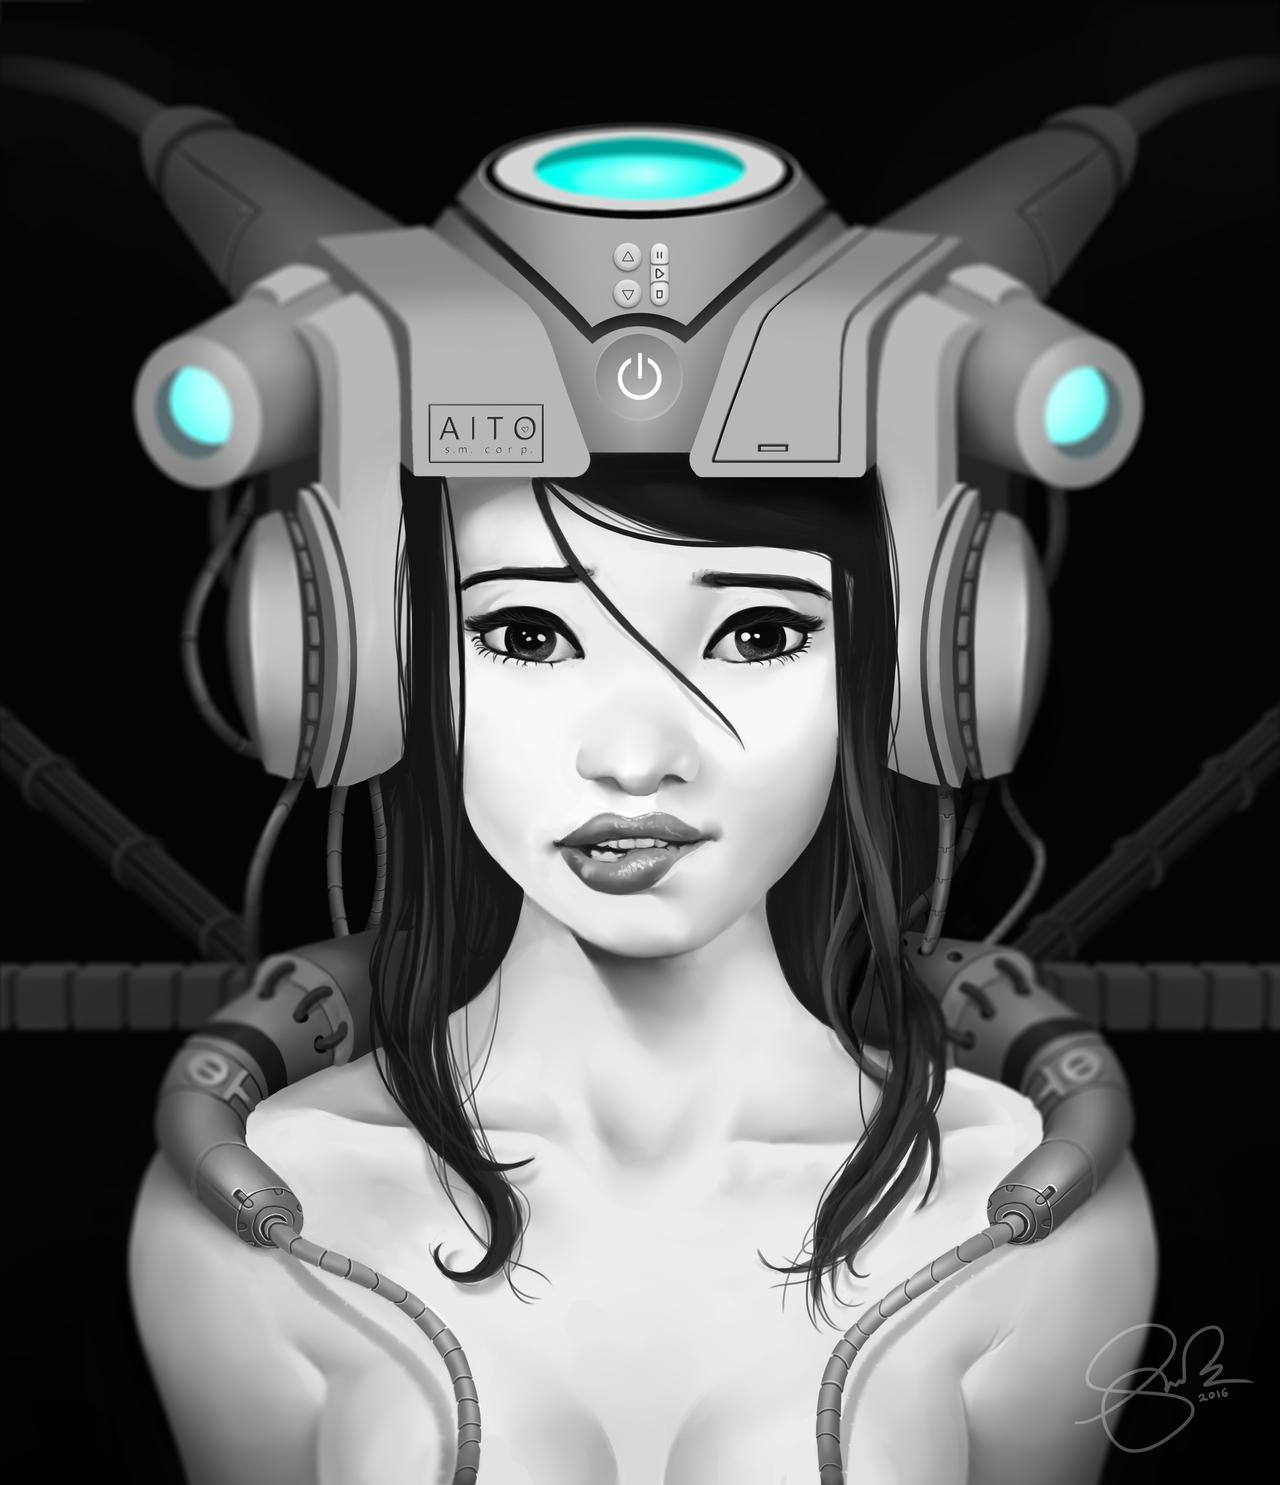 shellz-art's Profile Picture